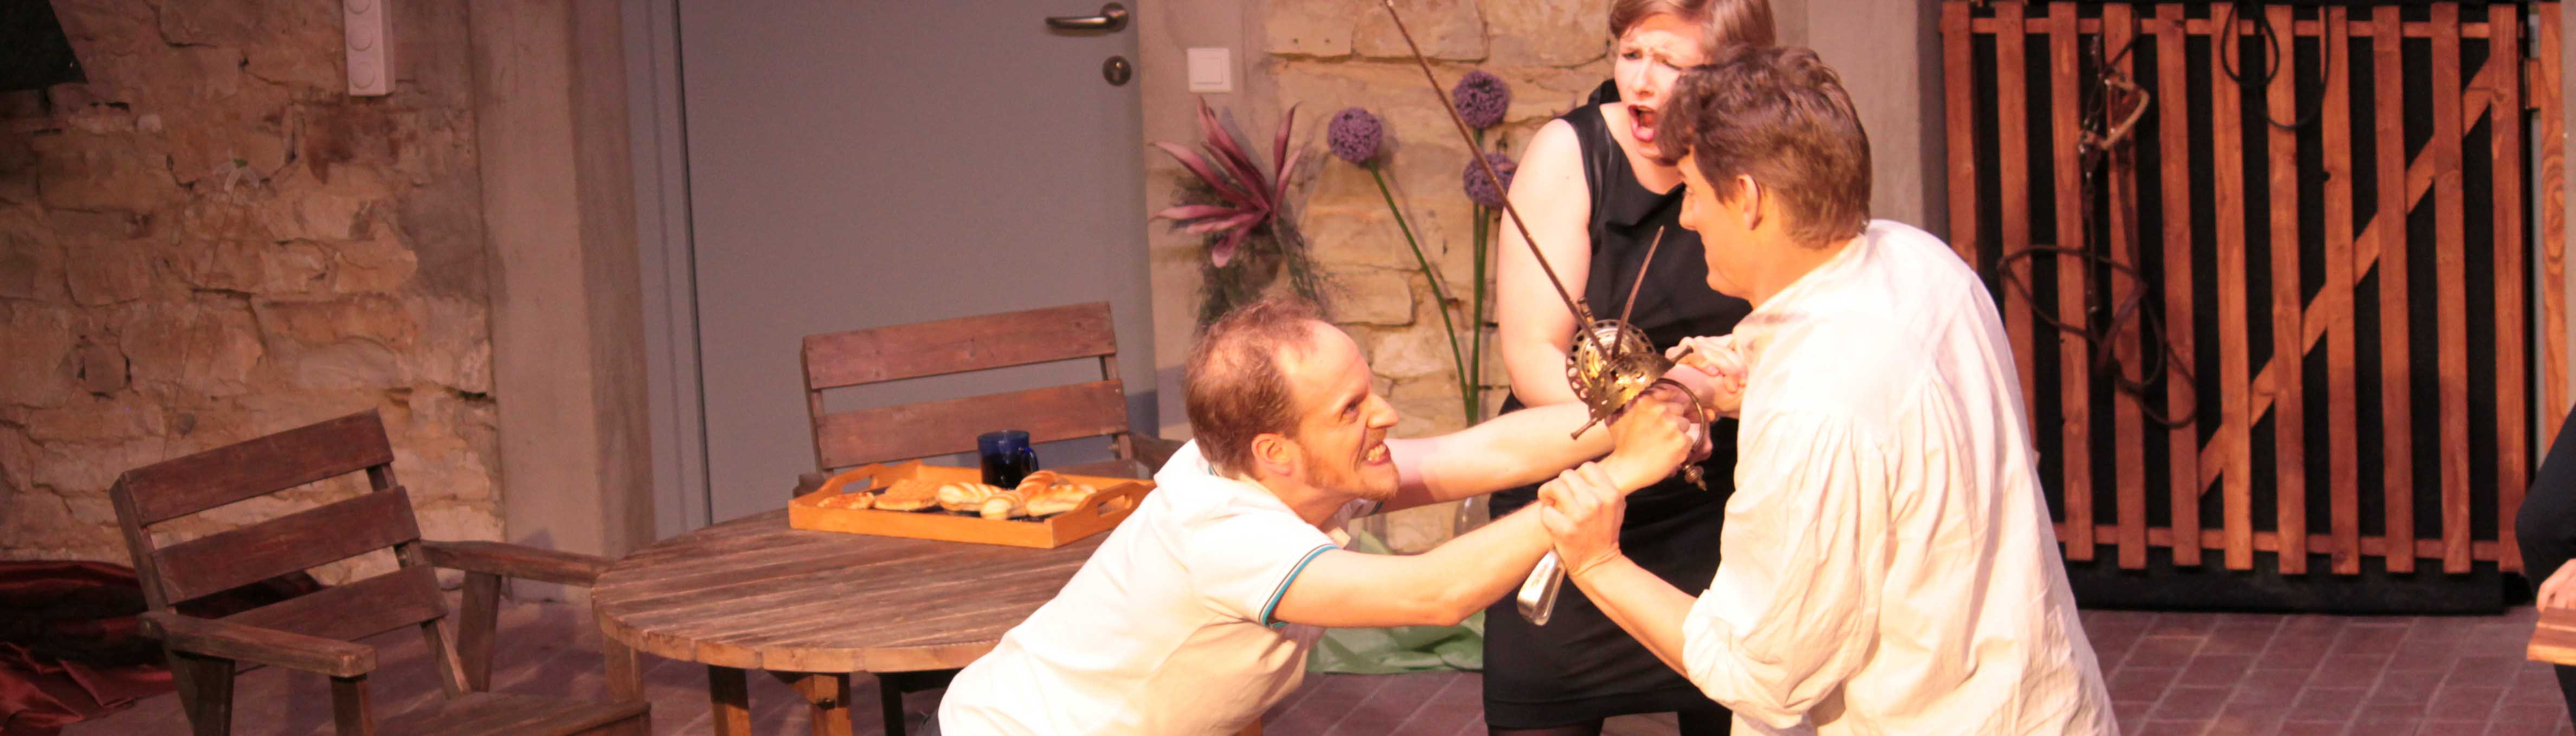 Theatergruppe Szenenwechsel